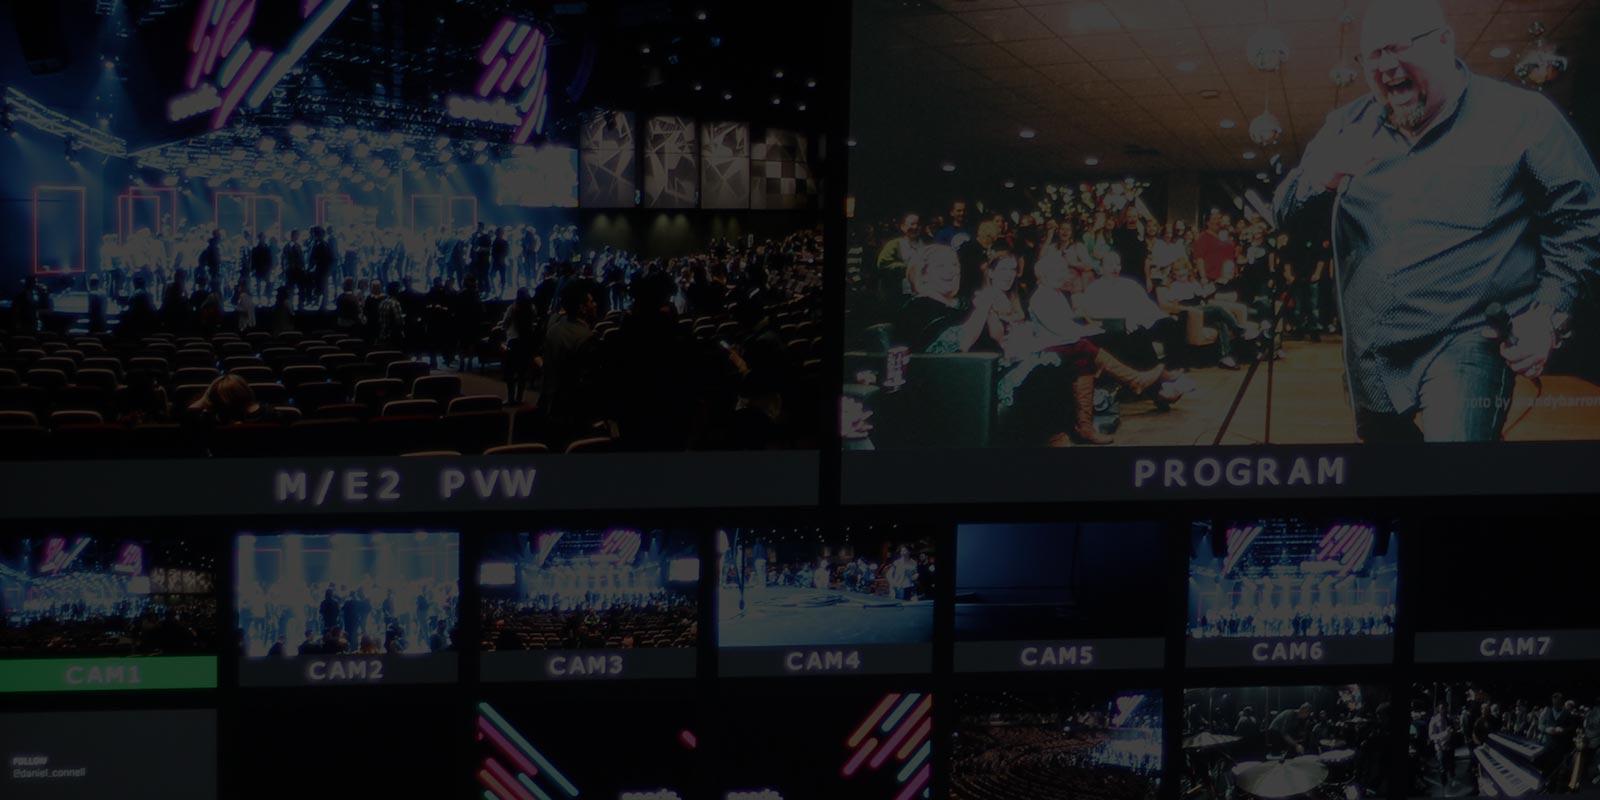 Lights, Camera, Conversion: Video for Nonprofits